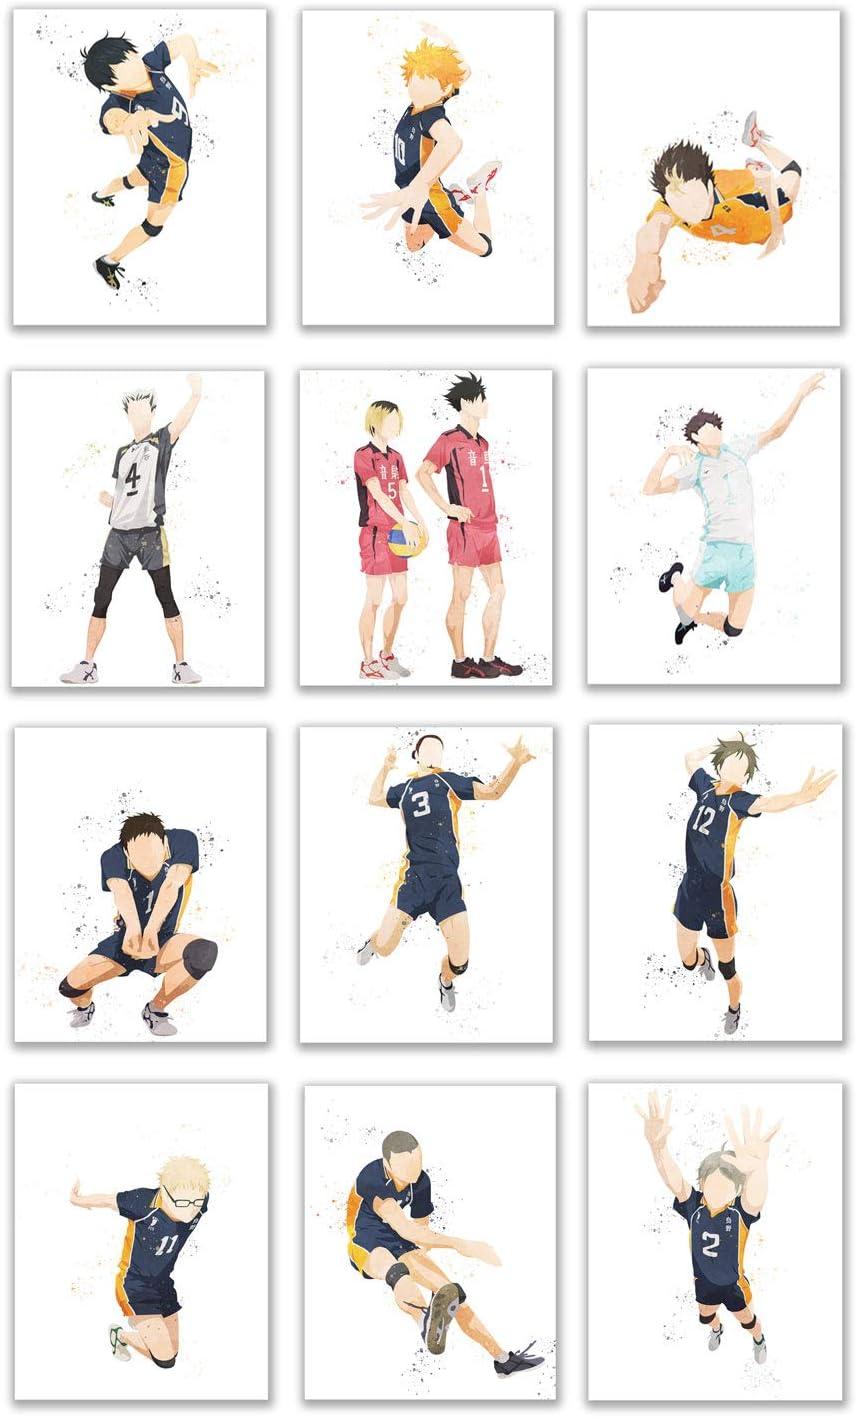 Watercolor Haikyuu!! Prints - Set of 12 (8x10 Inches) Glossy Anime Wall Art Decor - Hinata - Kageyama - Nishinoya - Oikawa - Tsukishima - Kuroo - Kozume - Suga - Tanaka - Yamaguchi - Bokuto - Asahi -